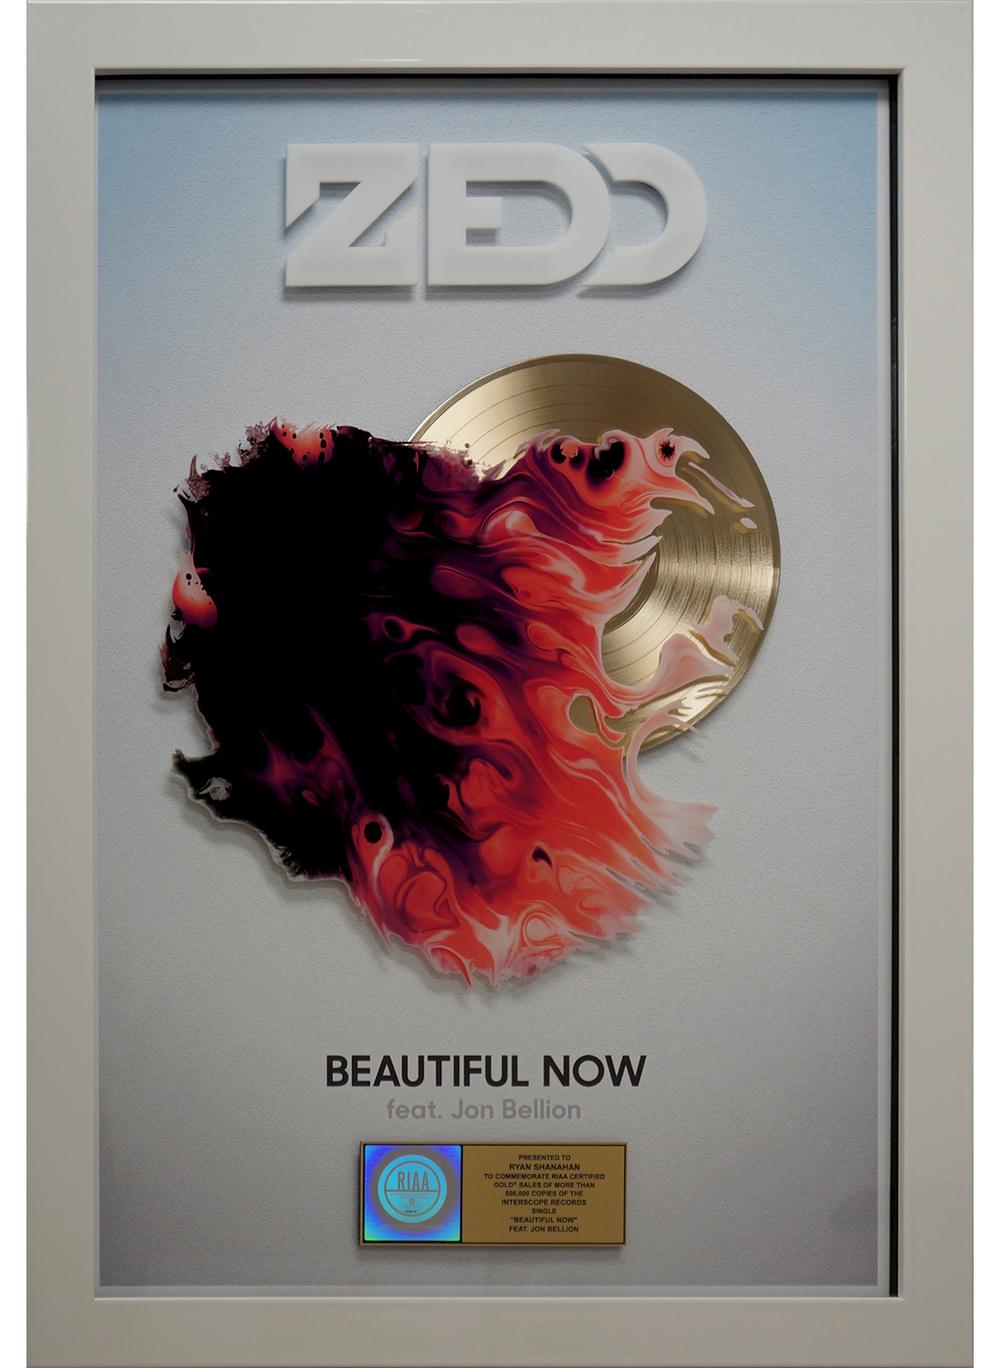 ZEDD feat Jon Bellion Beautiful Now award photo (005).jpg